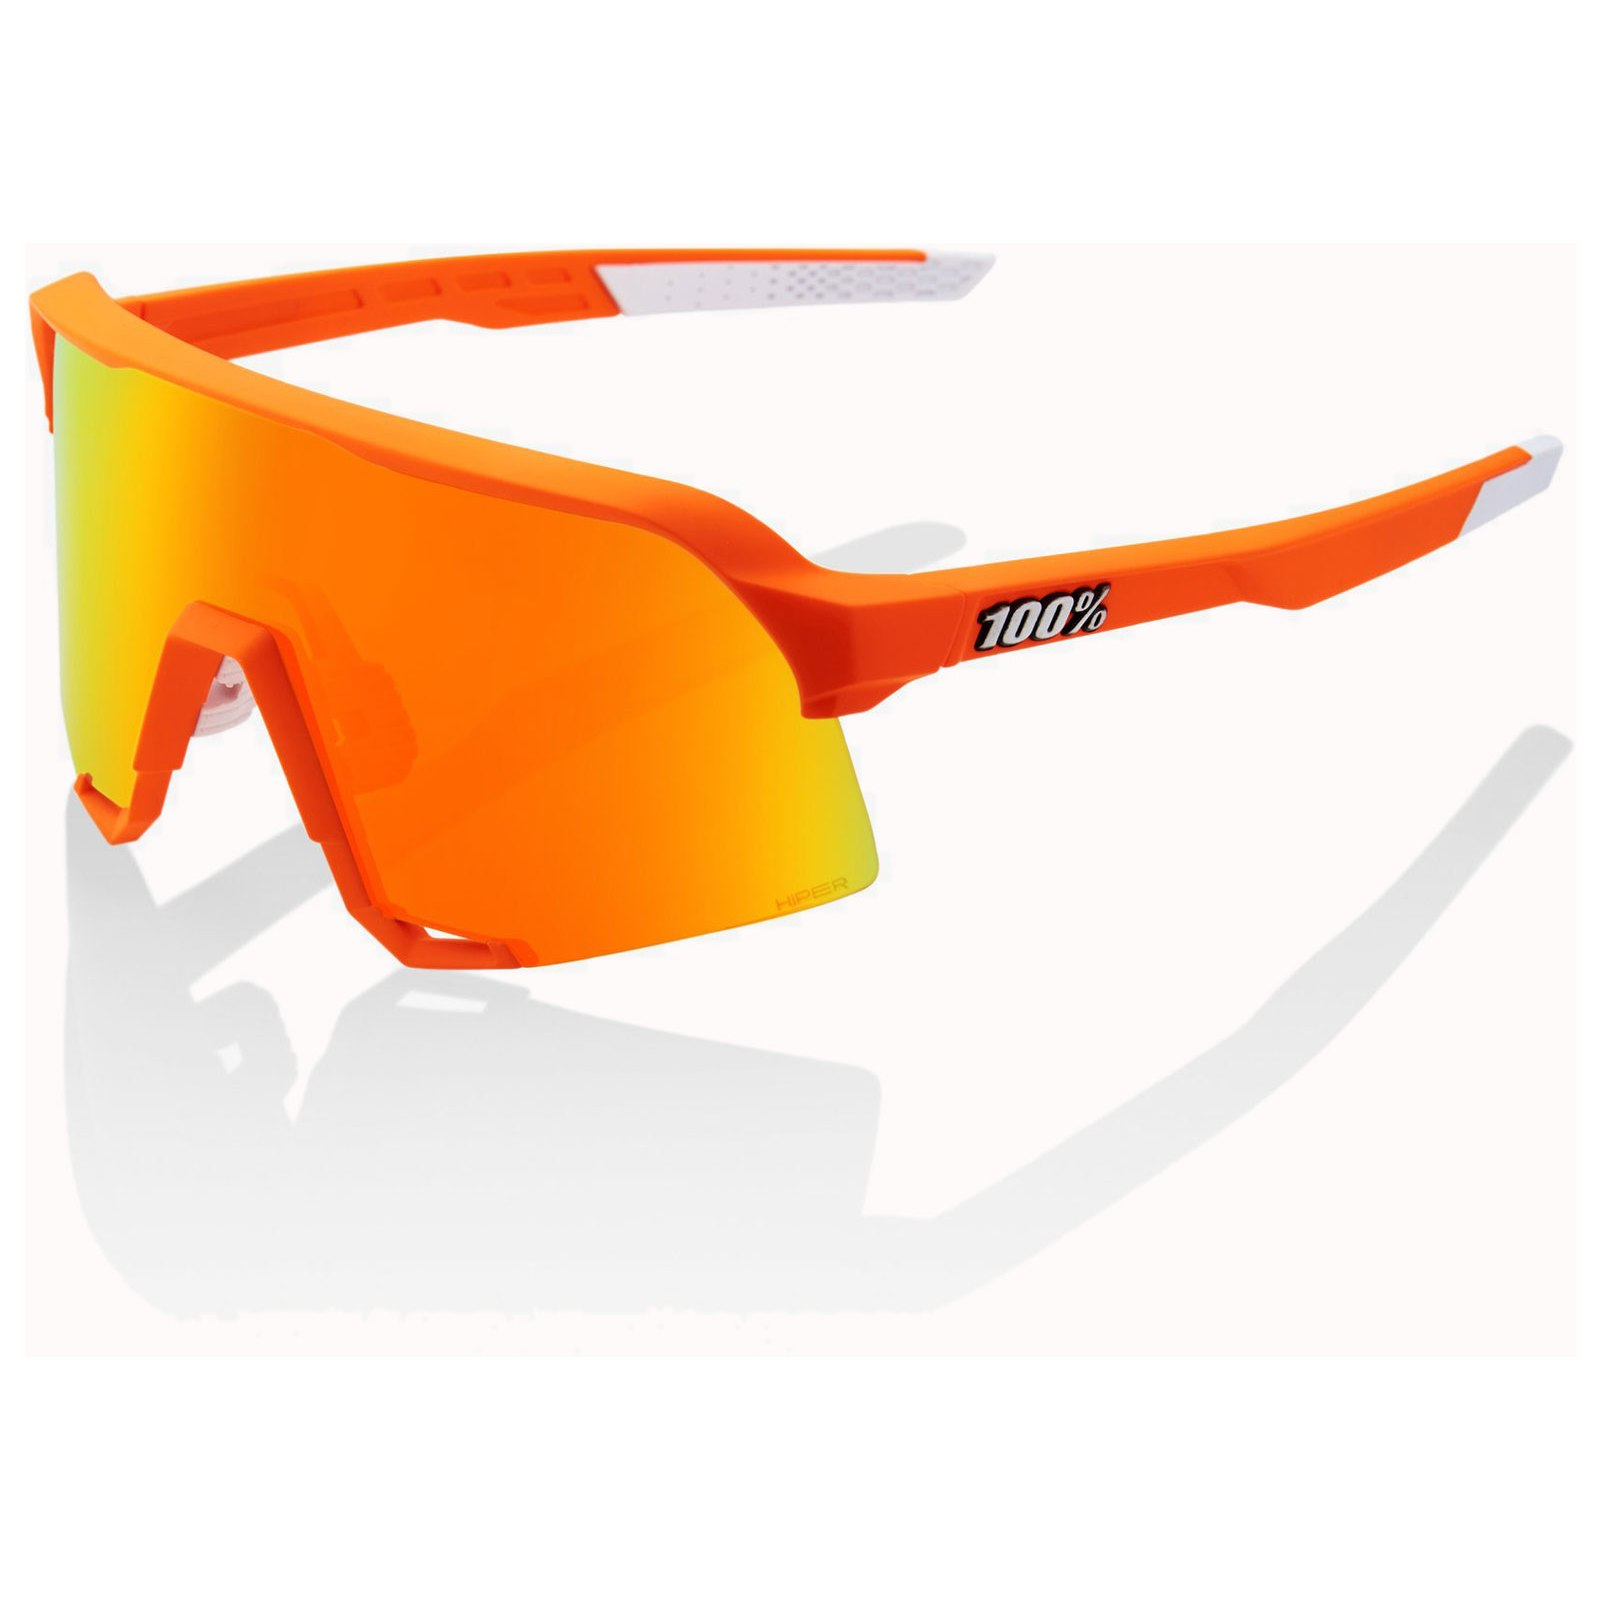 100% S3 HiPER Multilayer Mirror Lens Glasses - Limited Editon Neon Orange